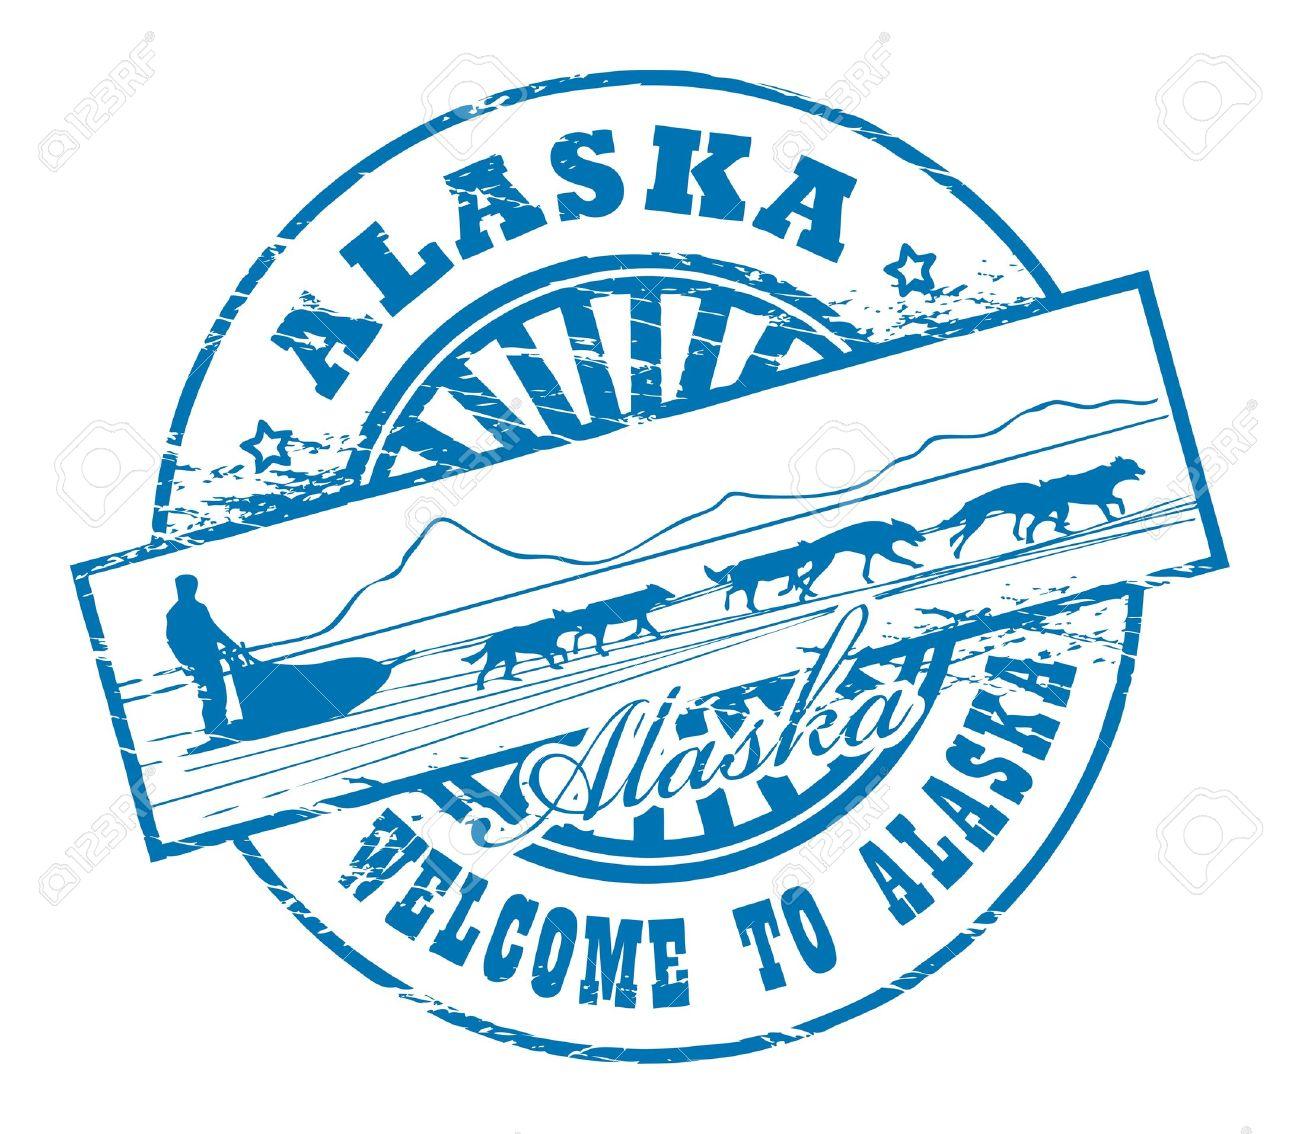 Clip Art Alaska Clip Art 5076 alaska stock vector illustration and royalty free clipart grunge rubber stamp with dog sled name of alaska